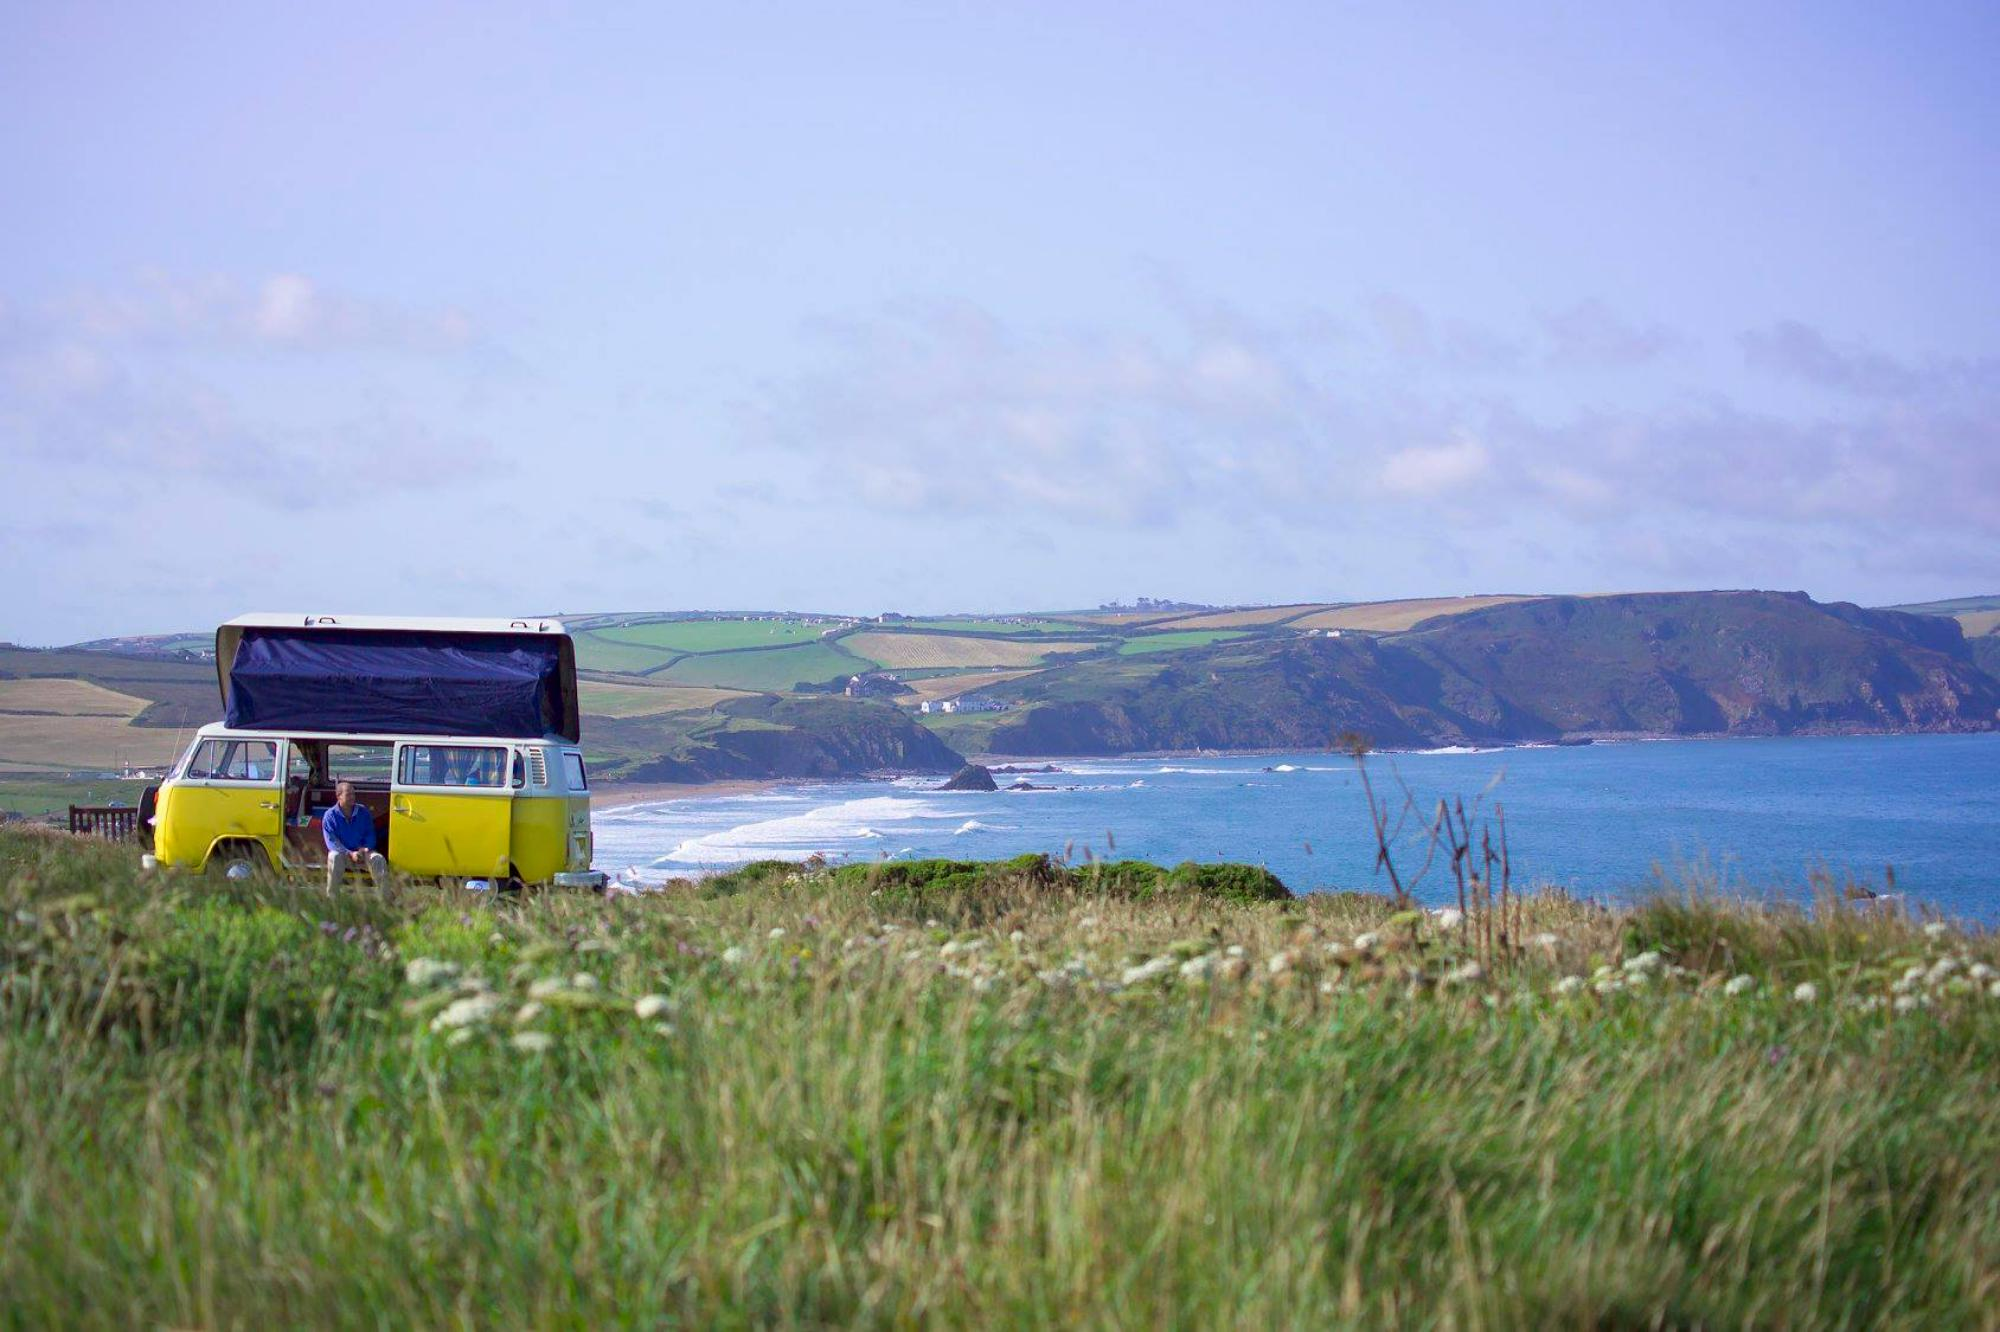 Campervan Hire in South West England | Motorhome Rental Companies